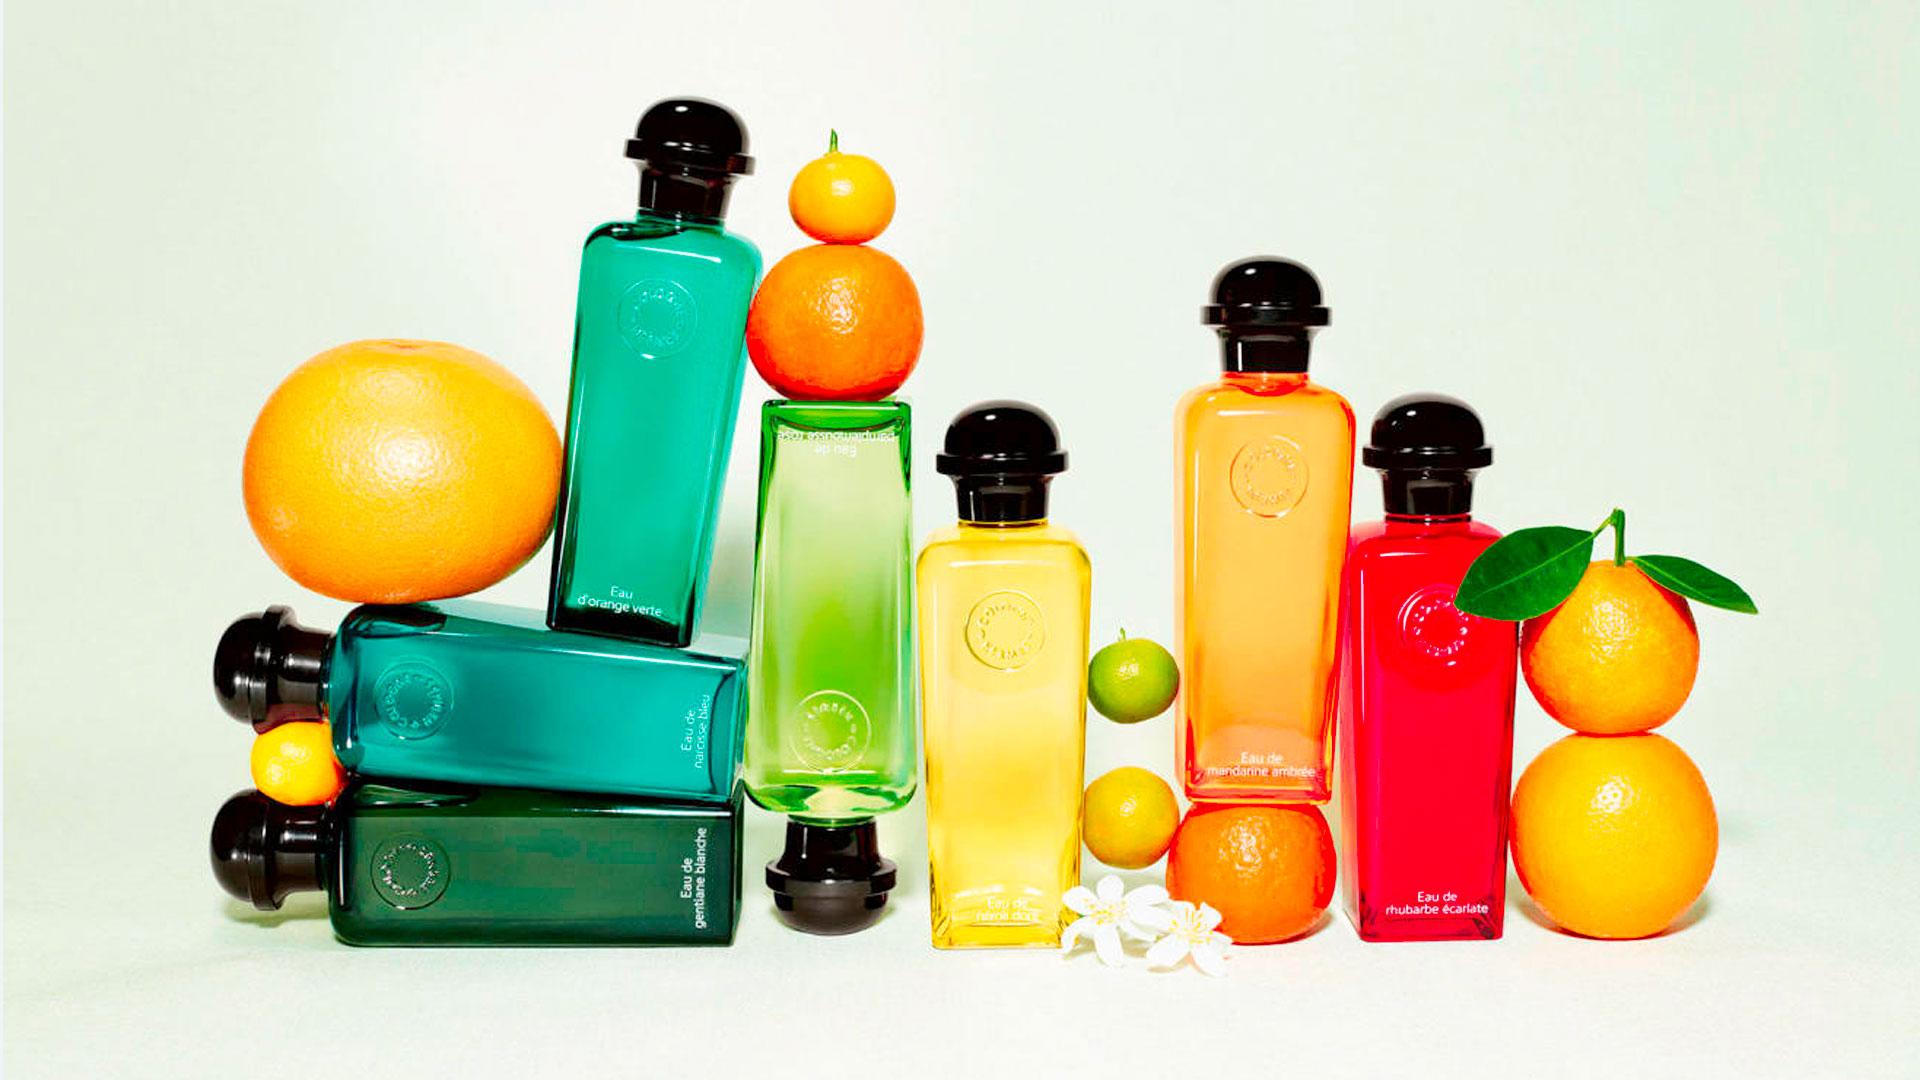 Bodegones de productos de la marca Hermès